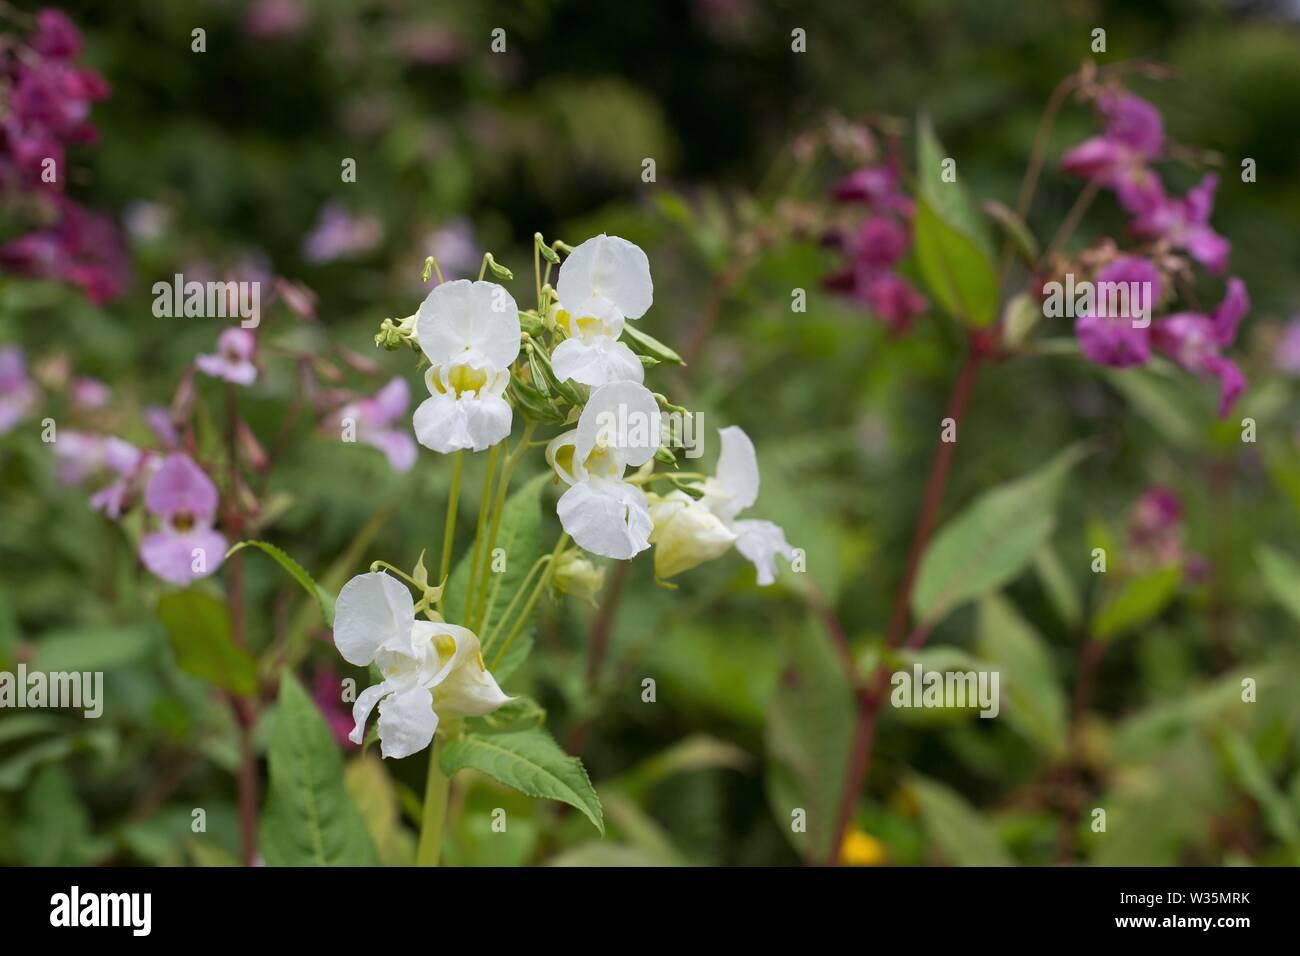 Impatiens glandulifera 'Himalayan Balsam' Blumen. Stockfoto